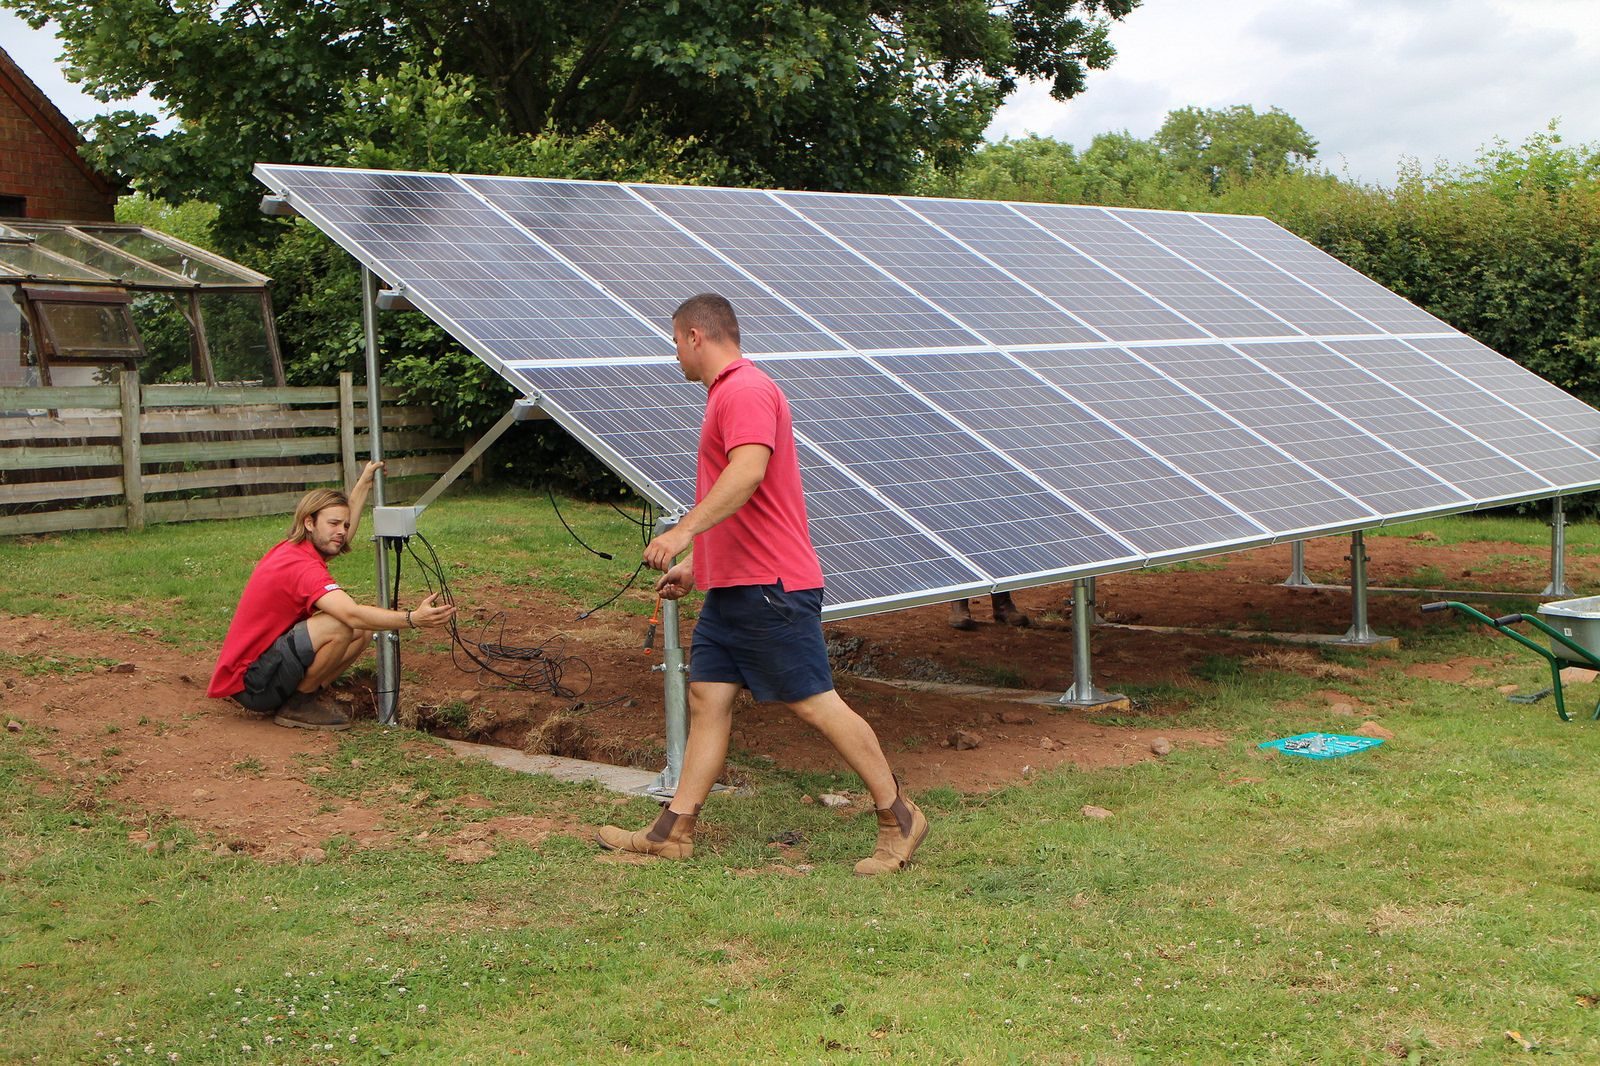 4kw Ground Mount Solar Pv System Kilcot Newent Solar Pv Systems Solar Pv Solar